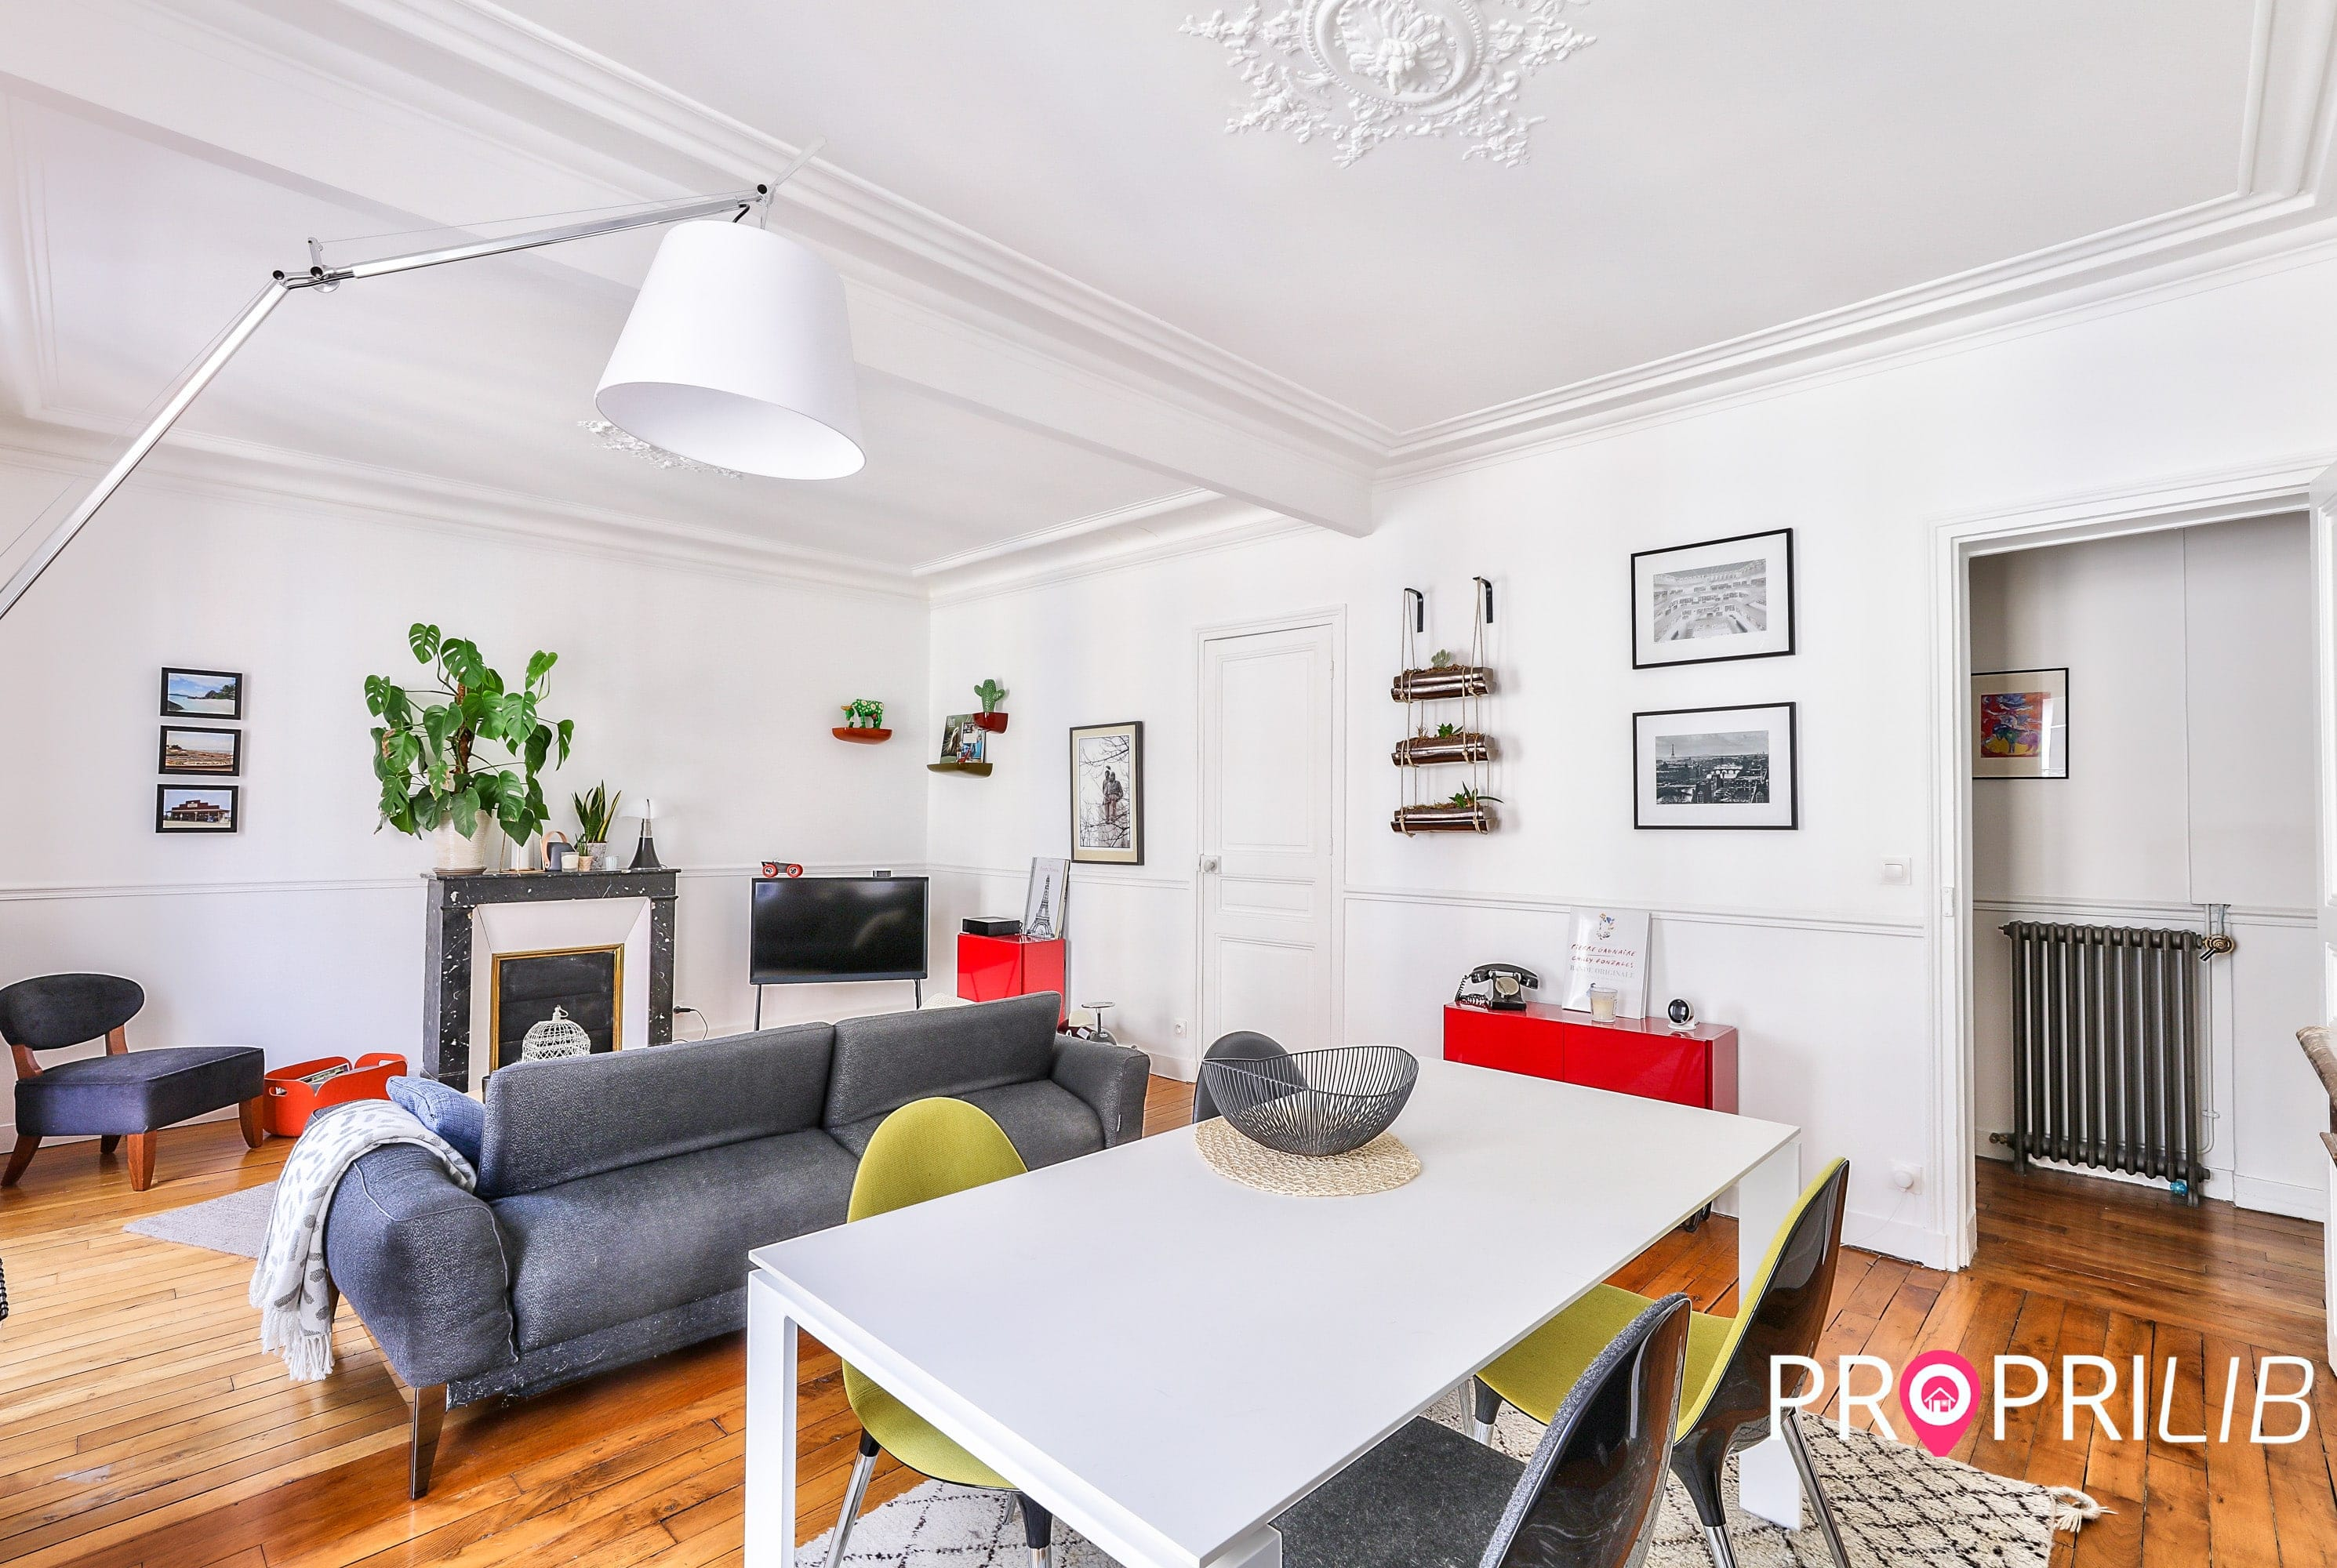 startup-immobilier-paris-proprilib-vente-immobiliere